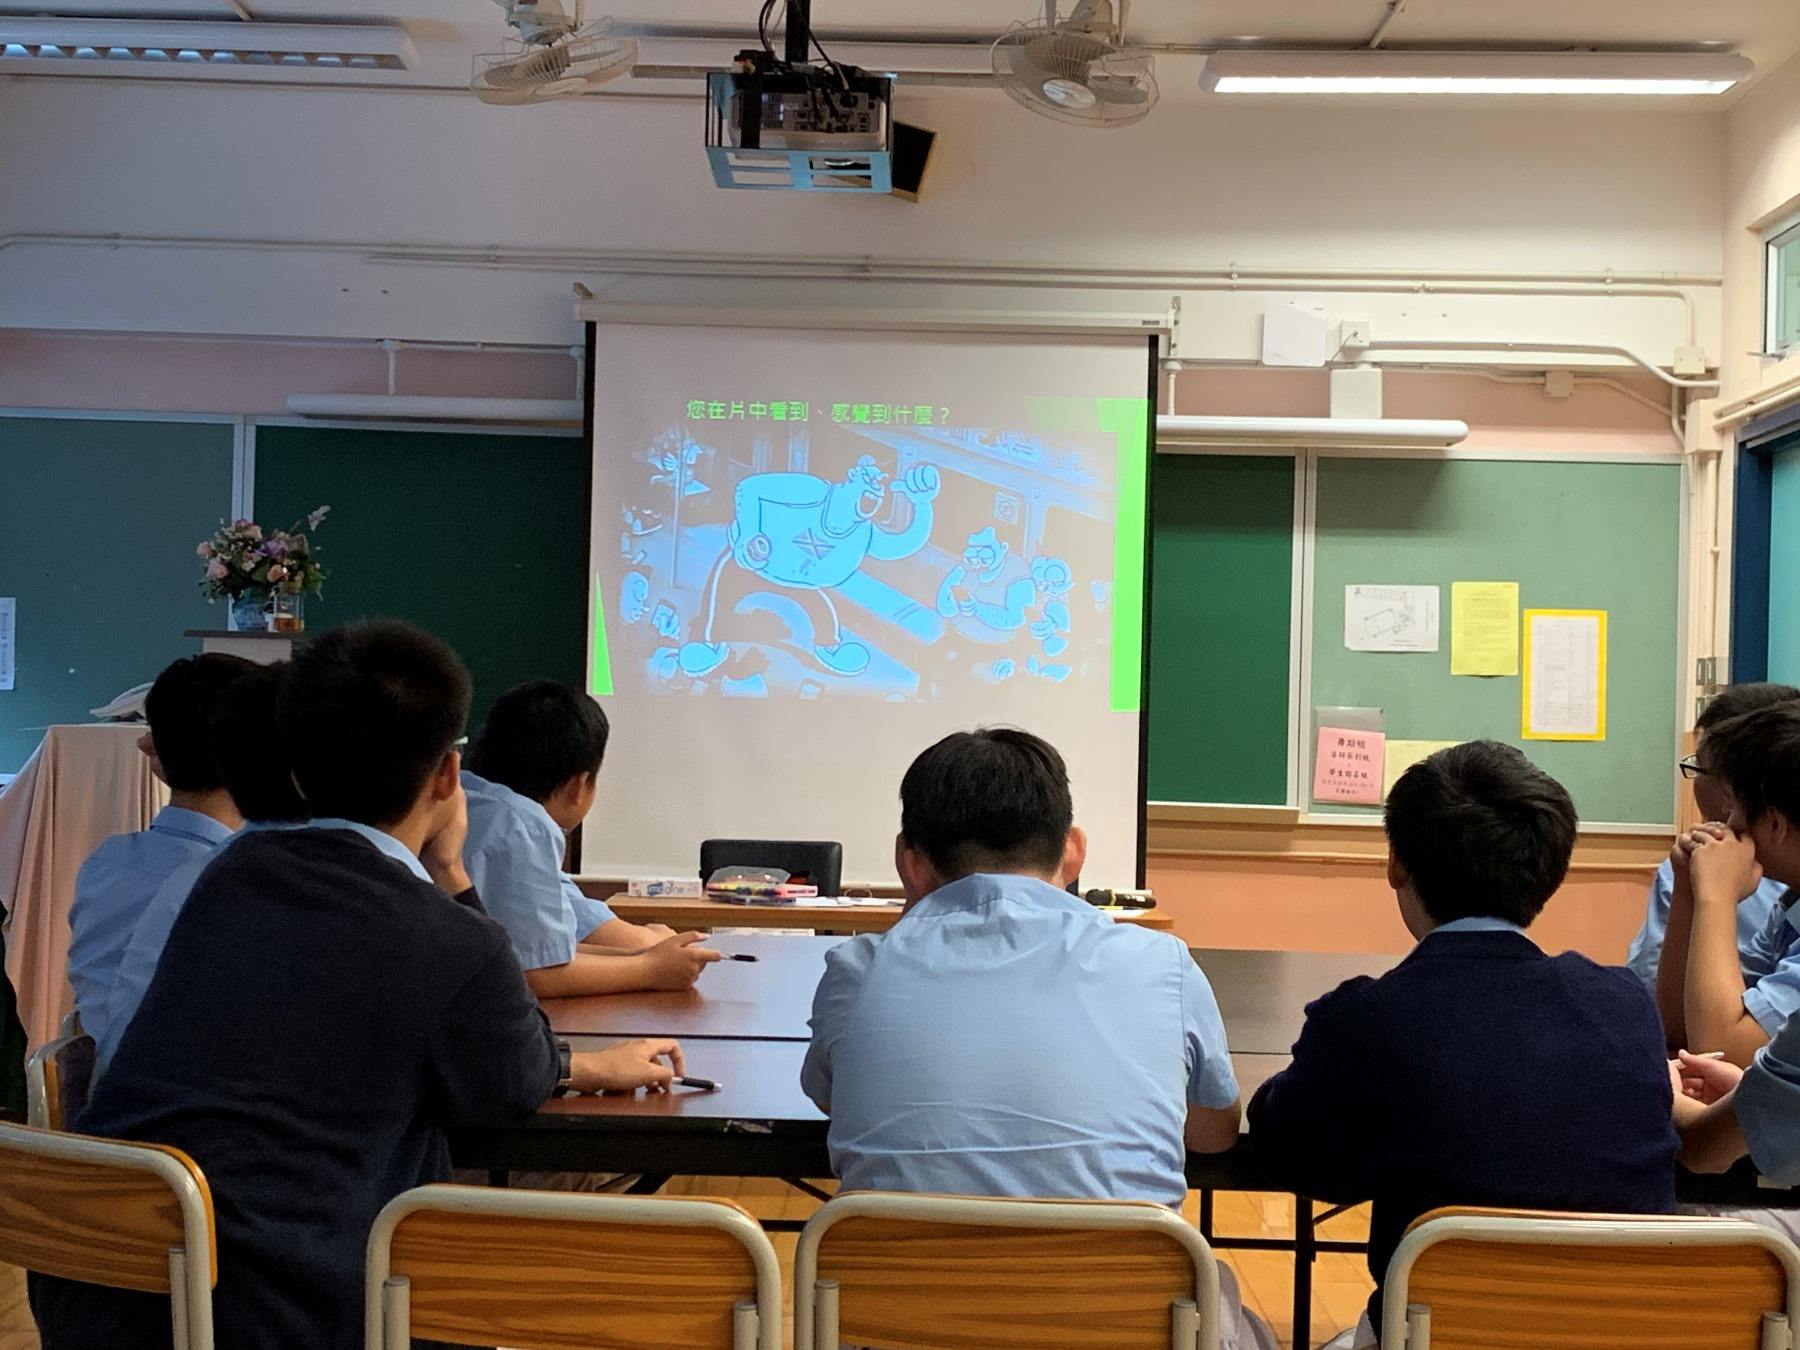 https://www.npc.edu.hk/sites/default/files/img_1497.jpg